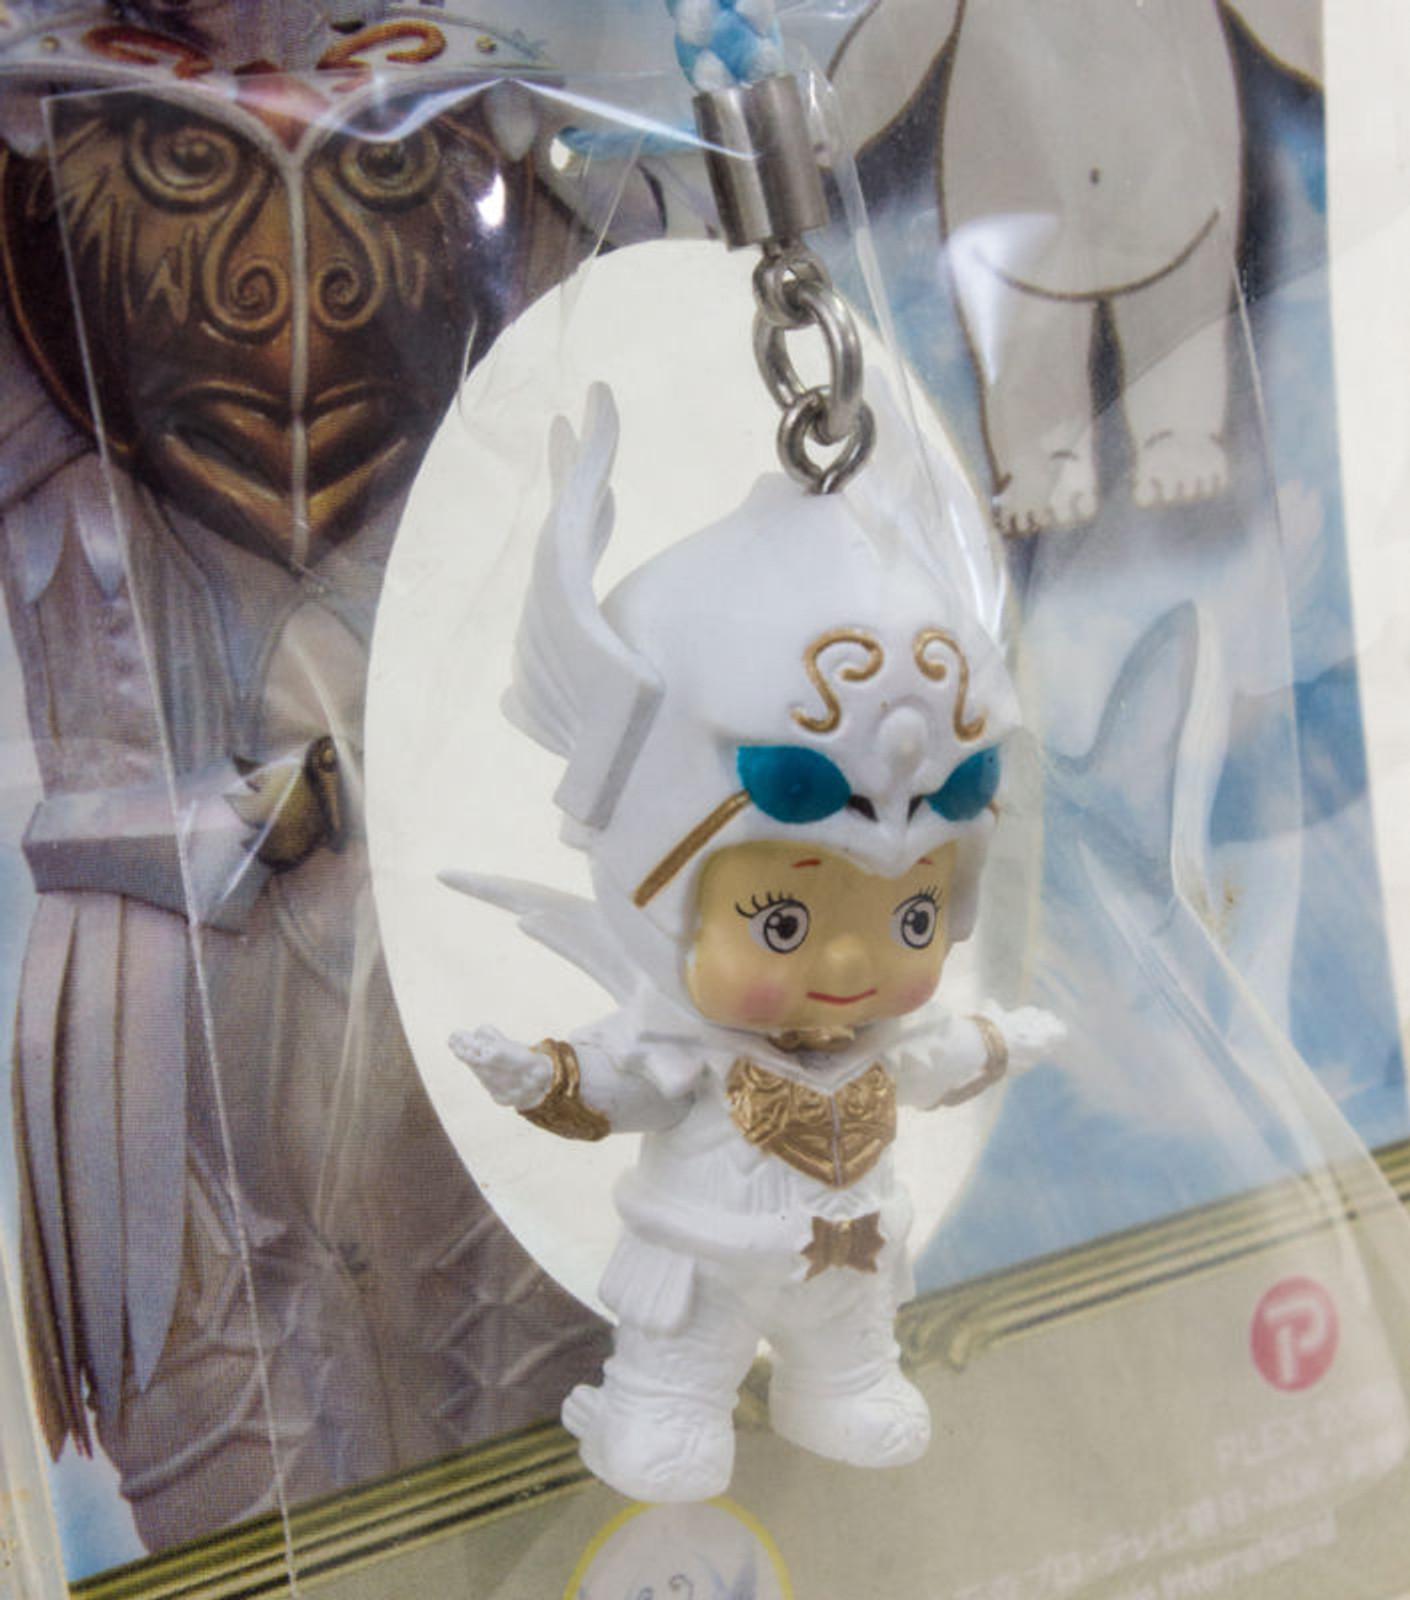 Kamen Rider Denoh Zeek Rose O'neill Kewpie Kewsion Strap JAPAN